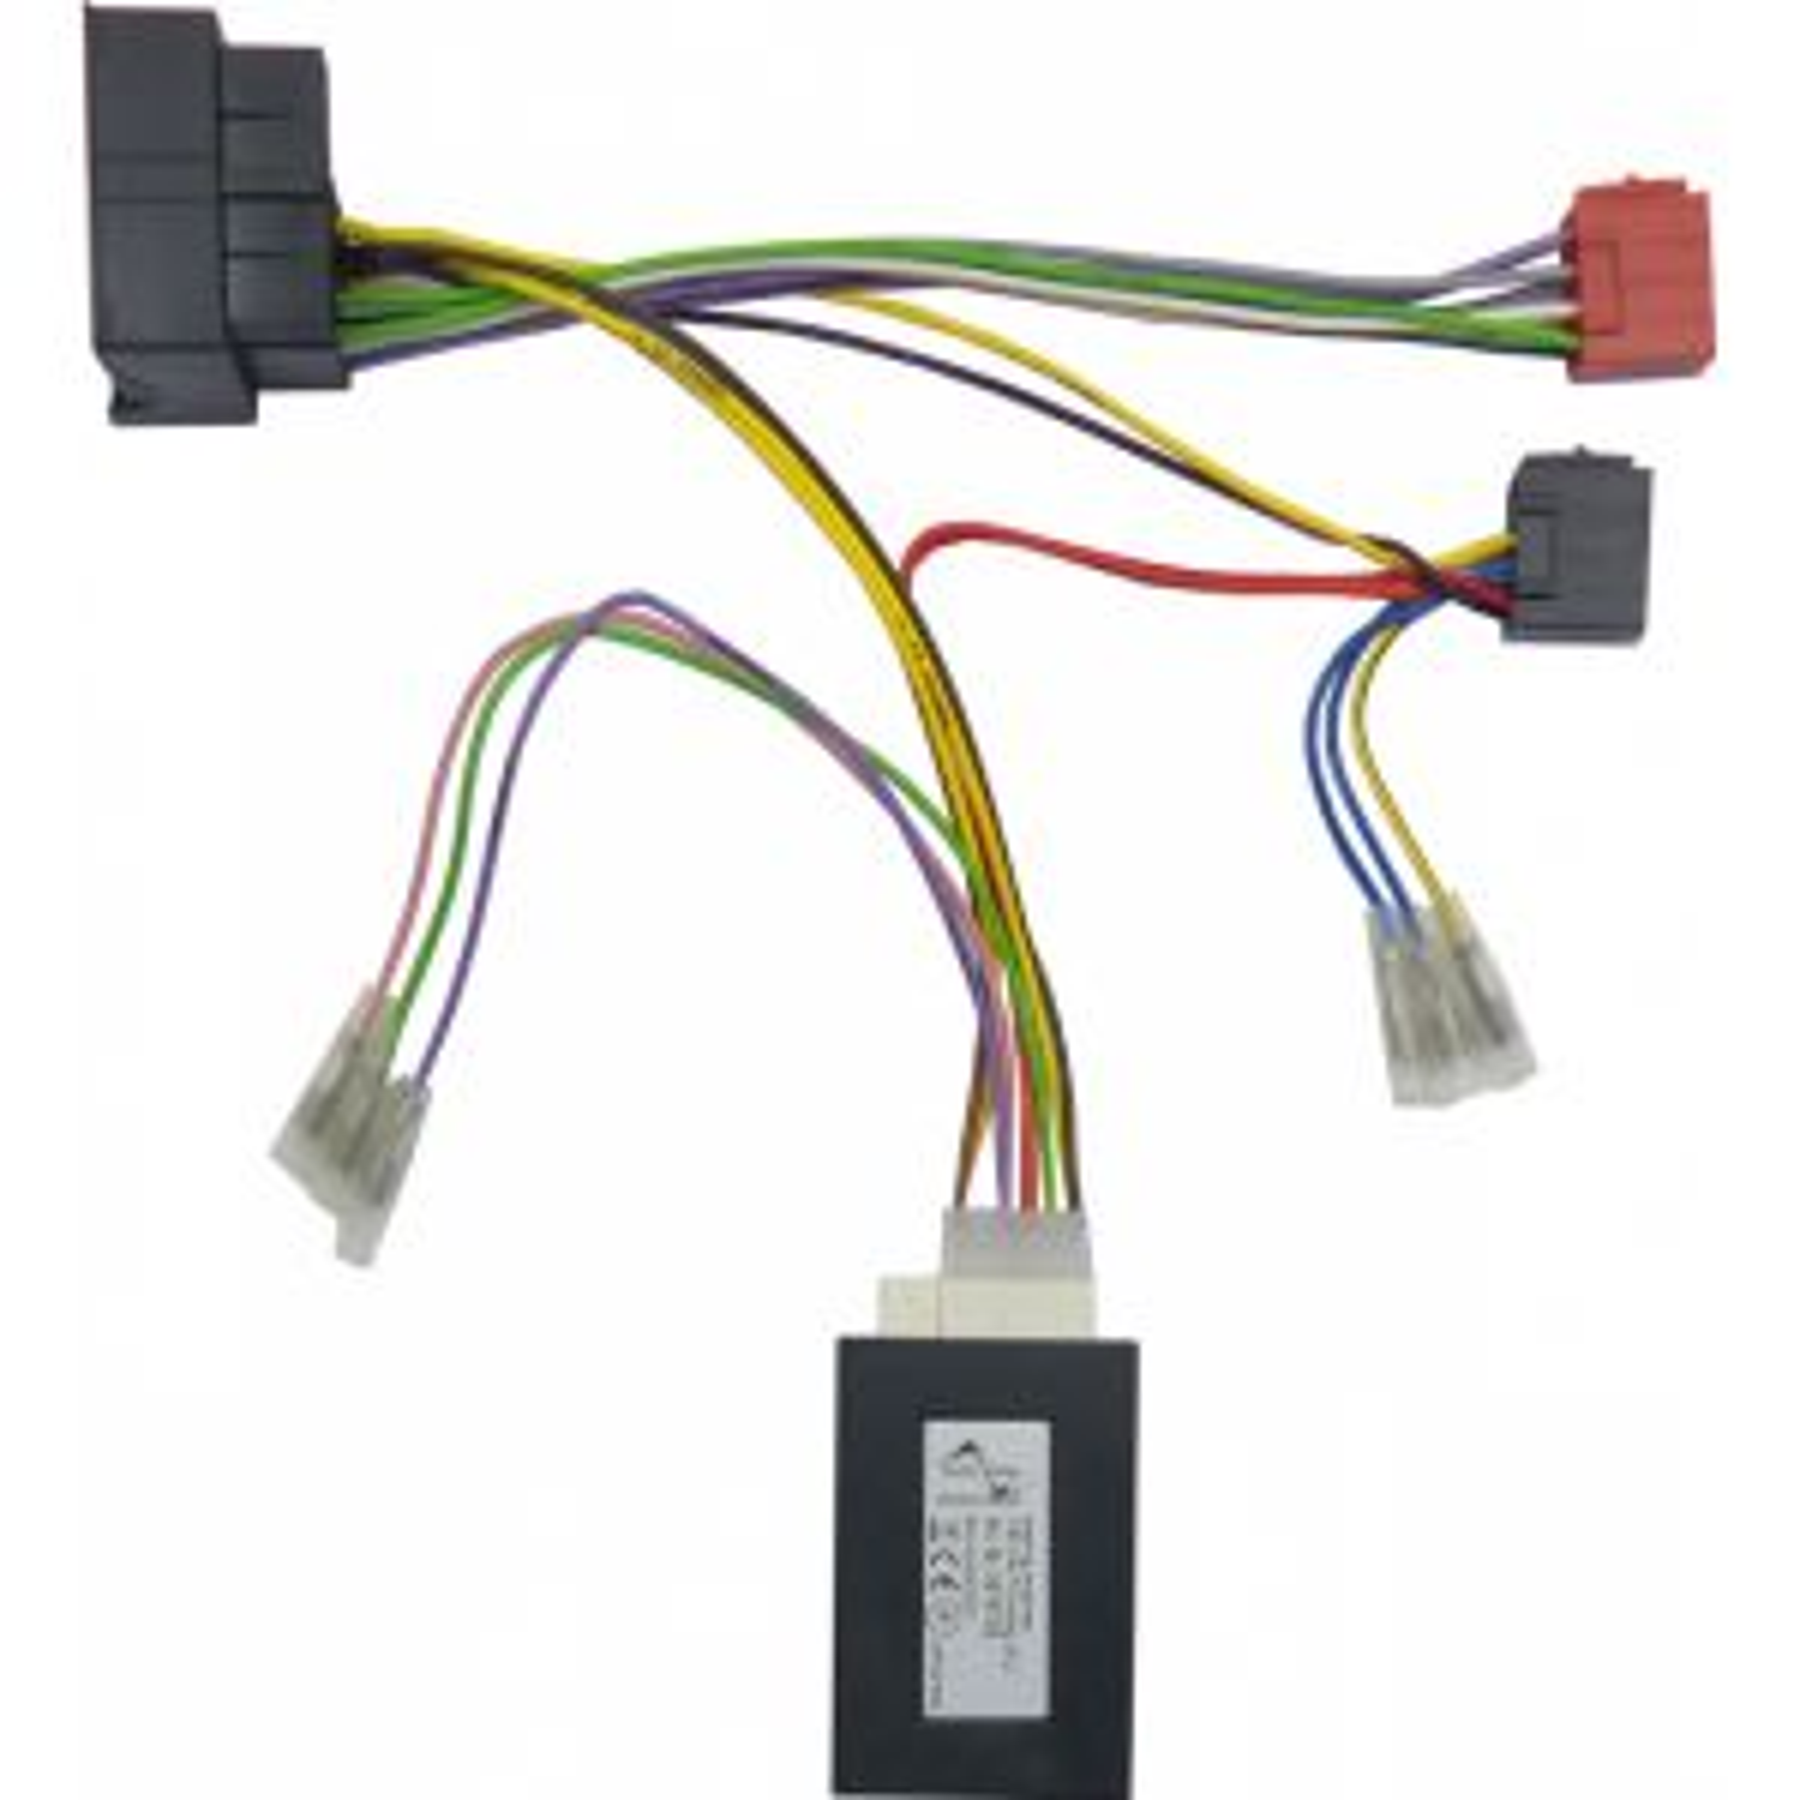 Speedsignal B-3474754